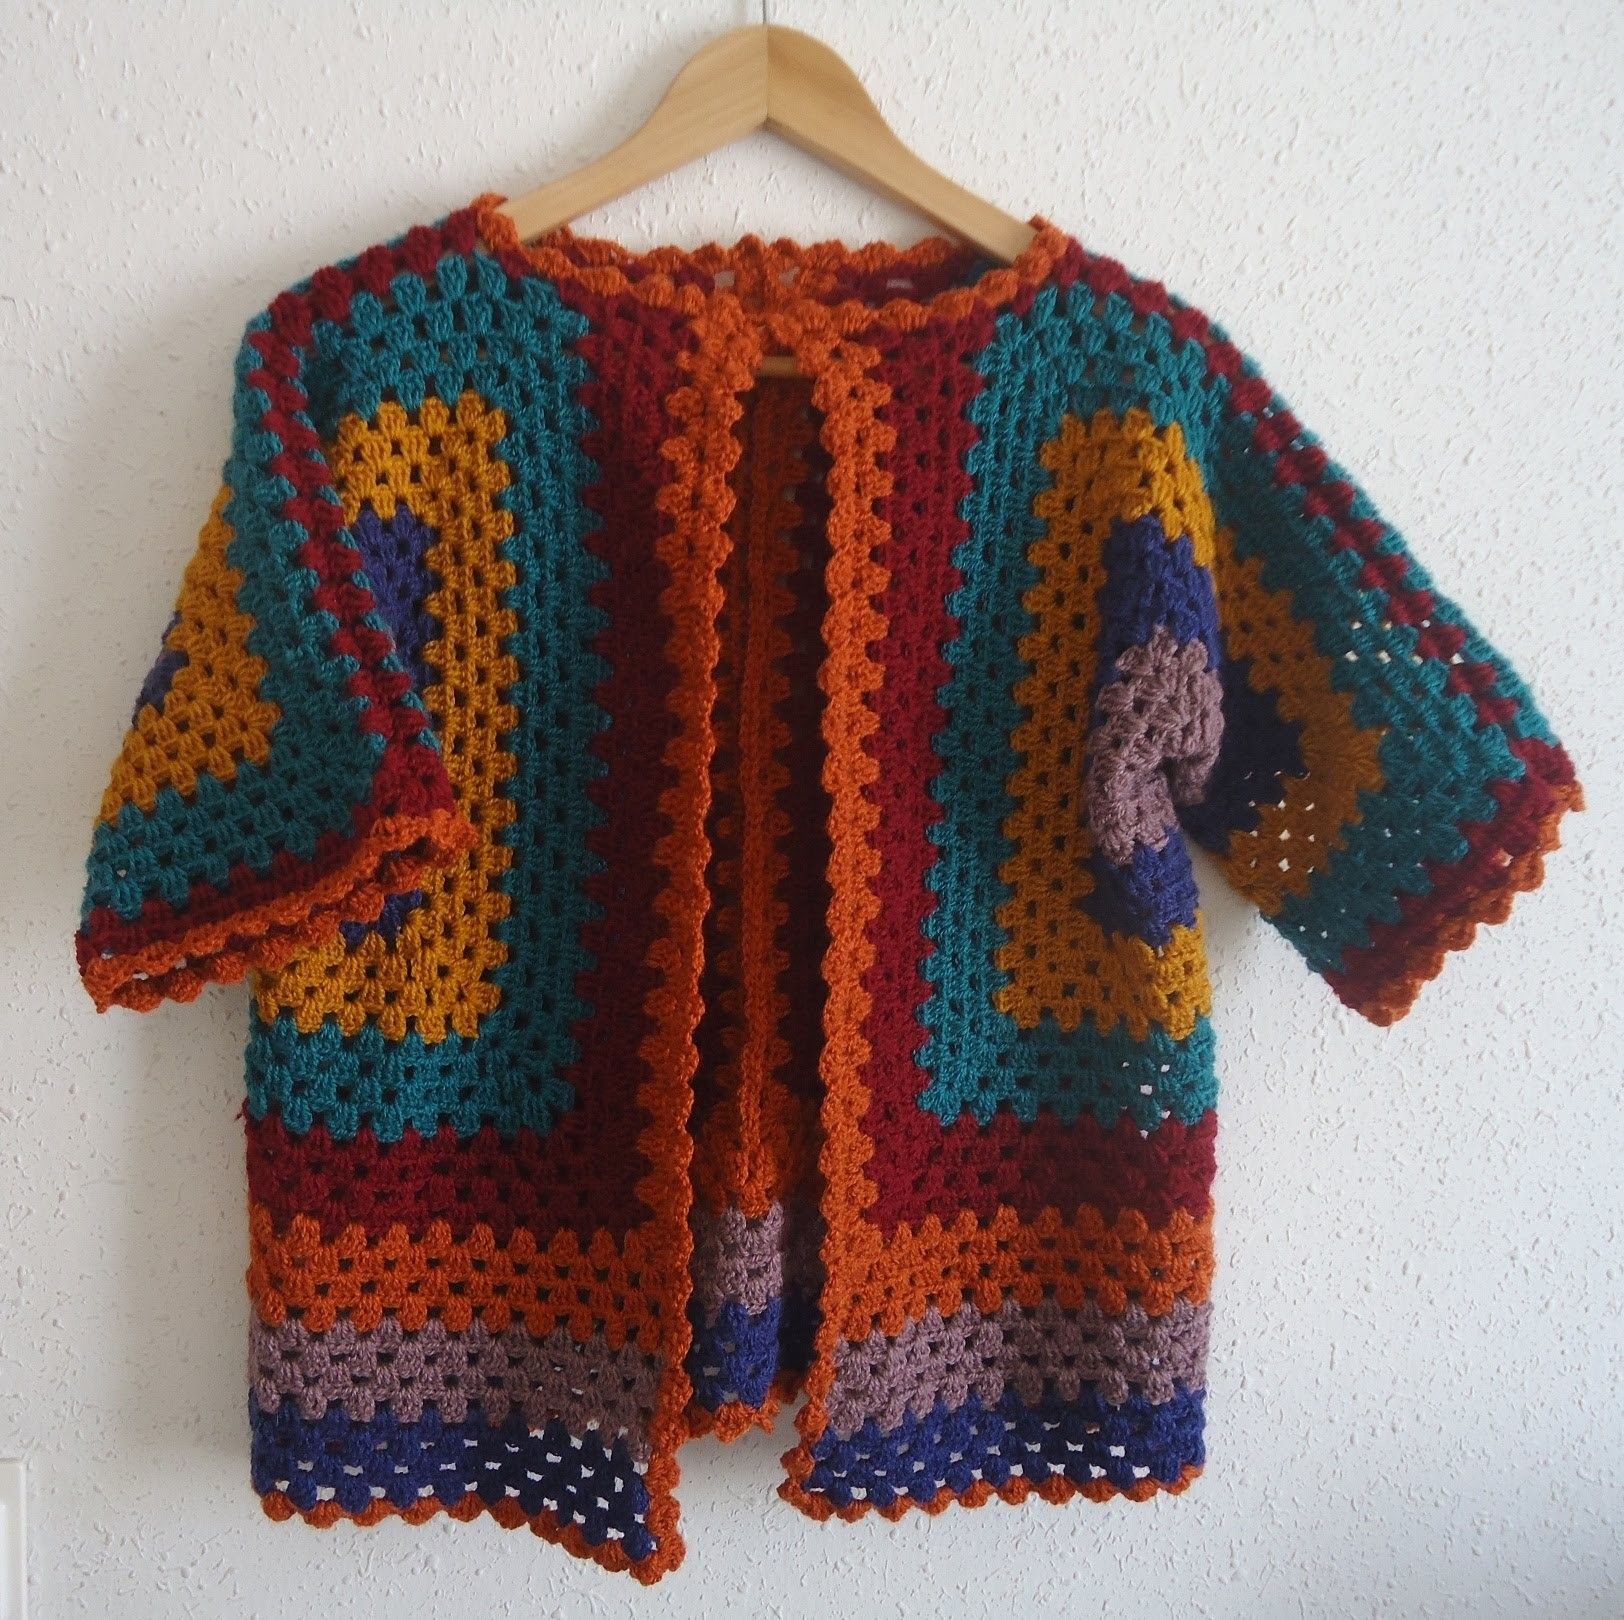 Tutorial Crochet Chaqueta Ganchillo Paso A Paso En Español Chaqueta De Ganchillo Chaqueta Crochet Suéter De Ganchillo